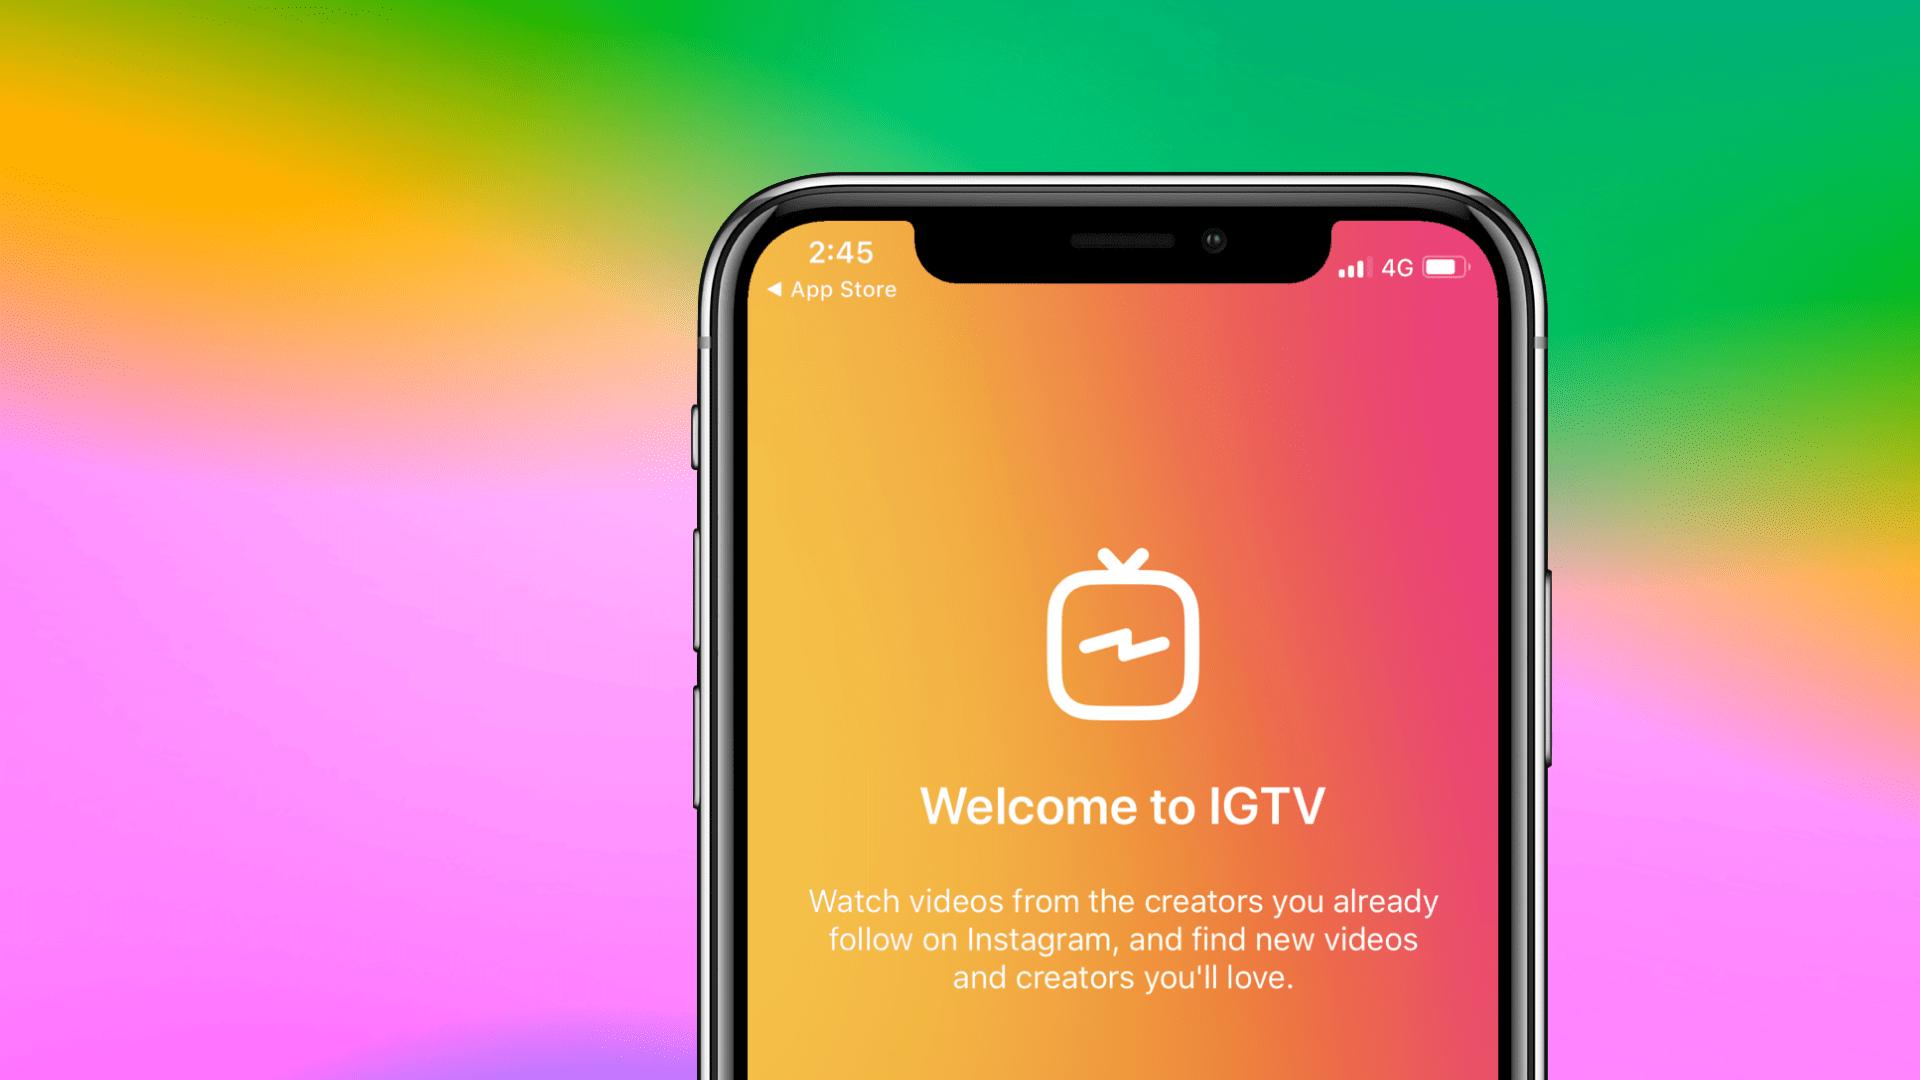 Igtv iphone app